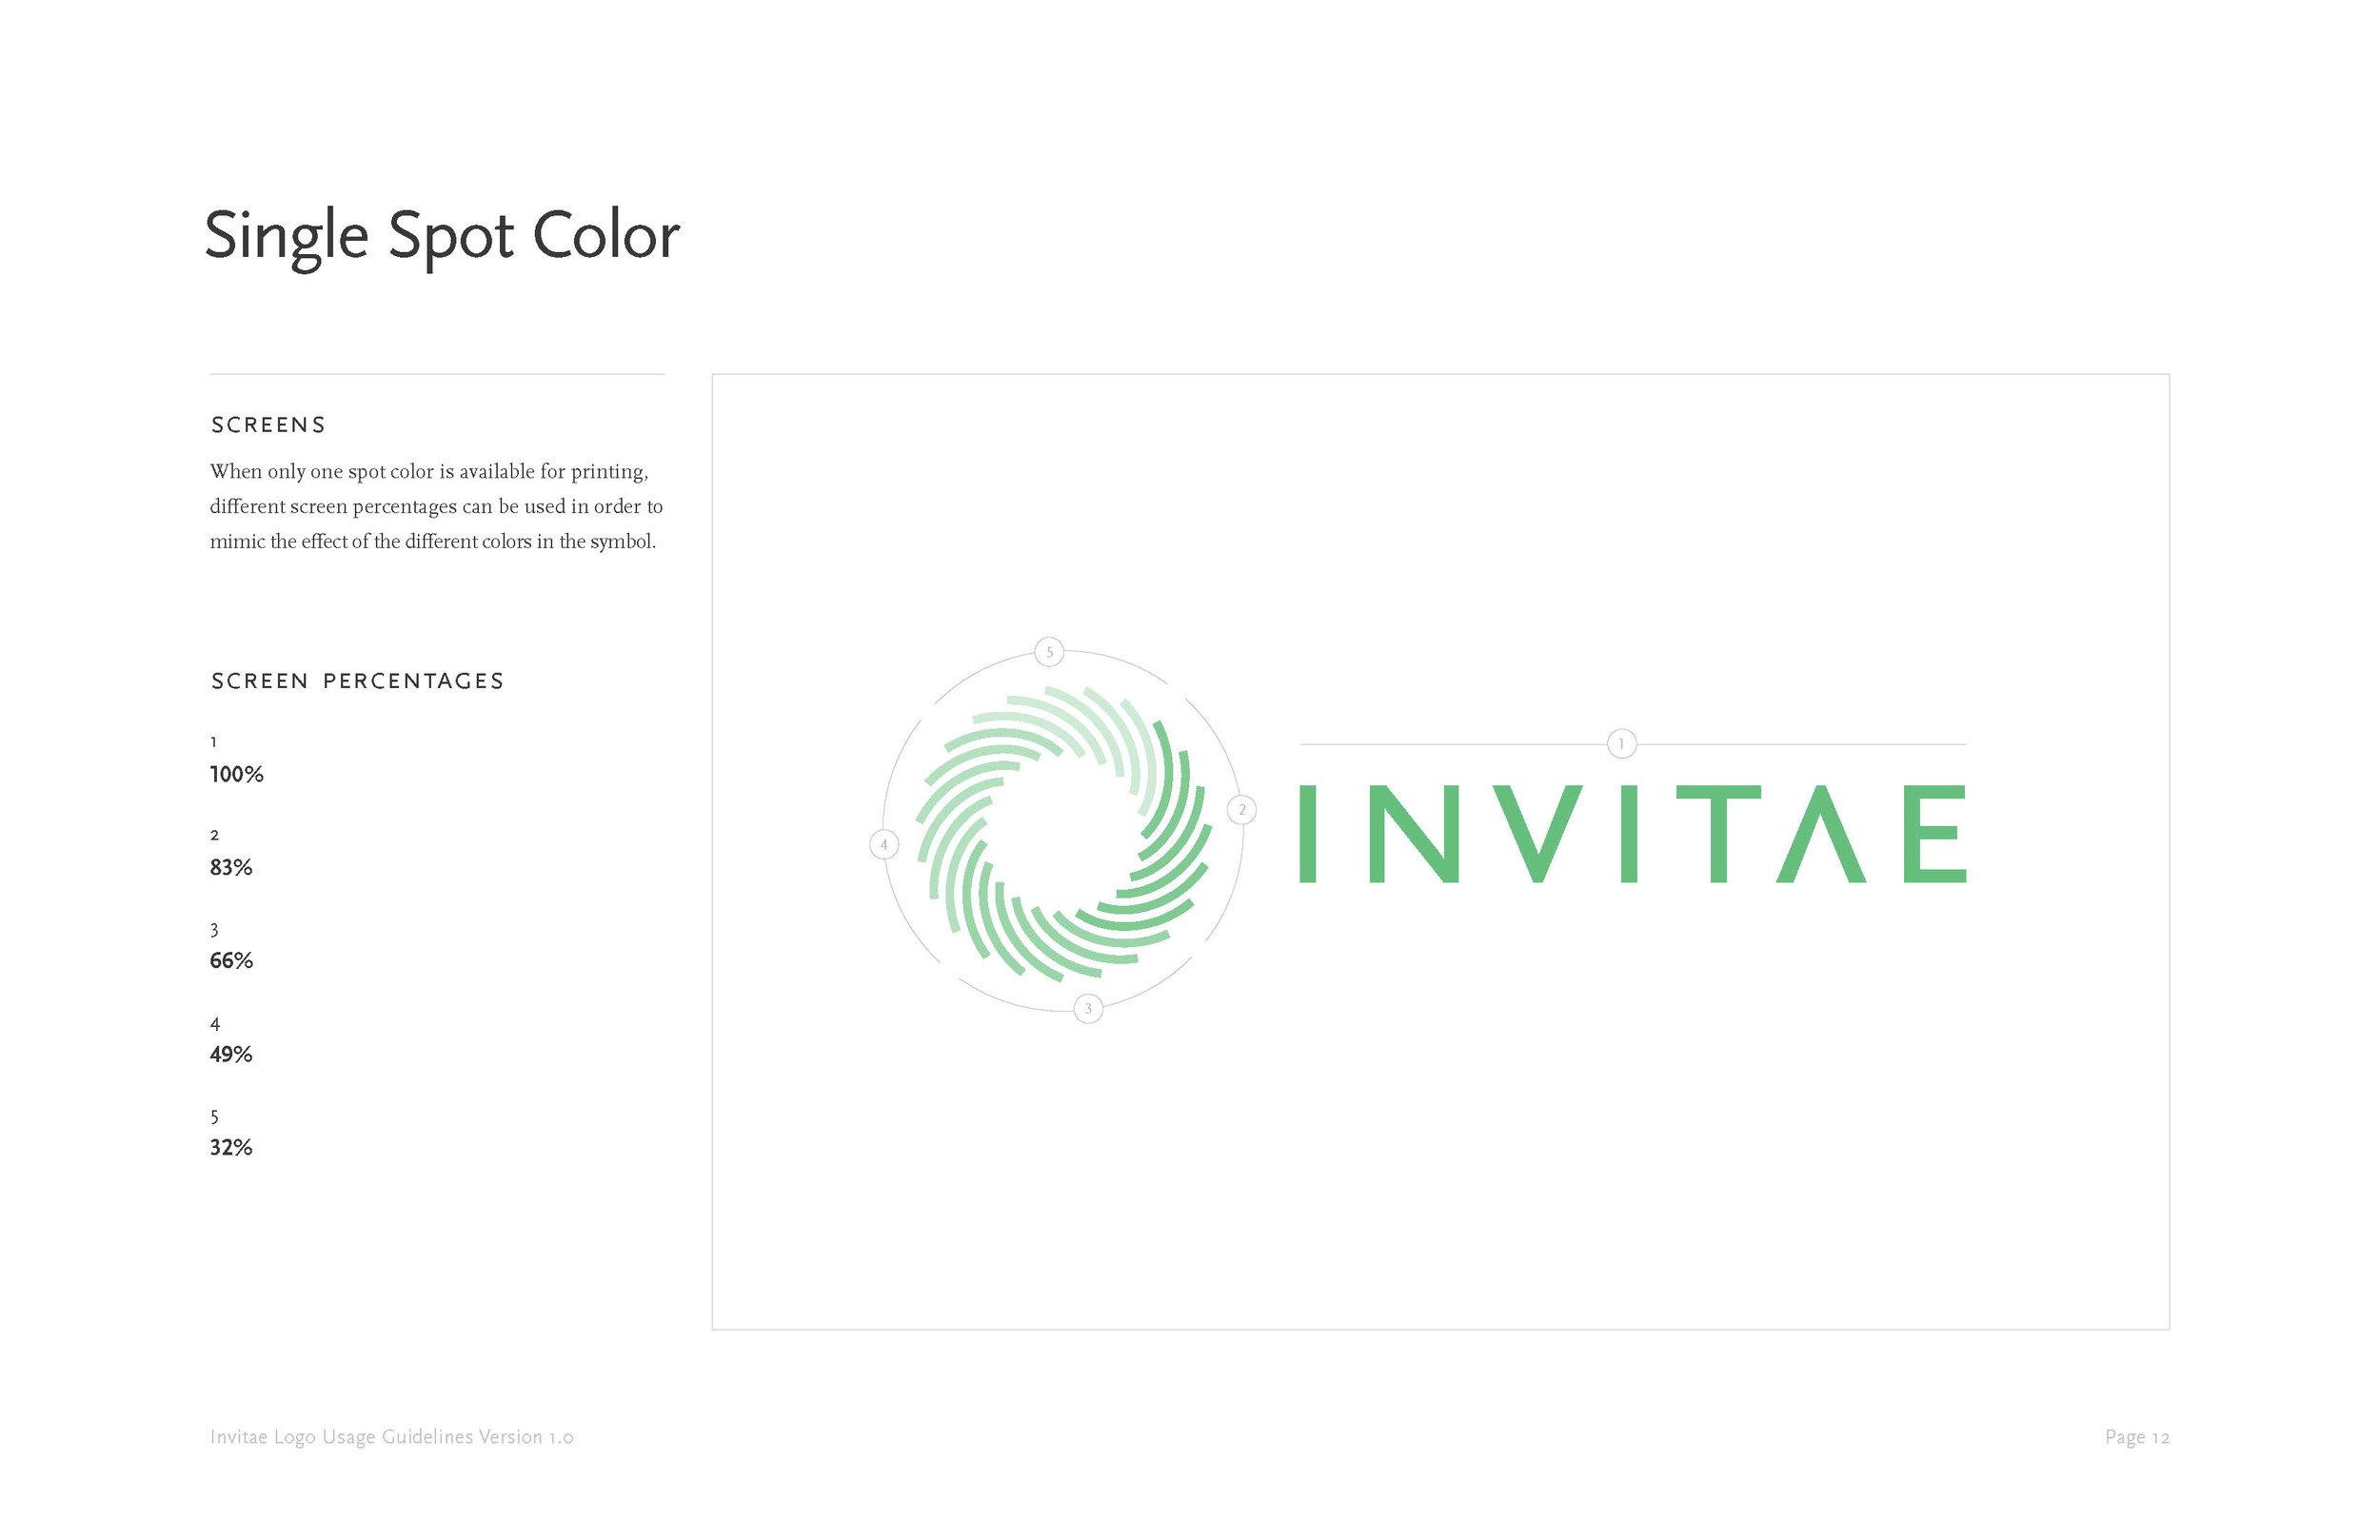 Invitae_logo_guidelines_Page_14.jpg